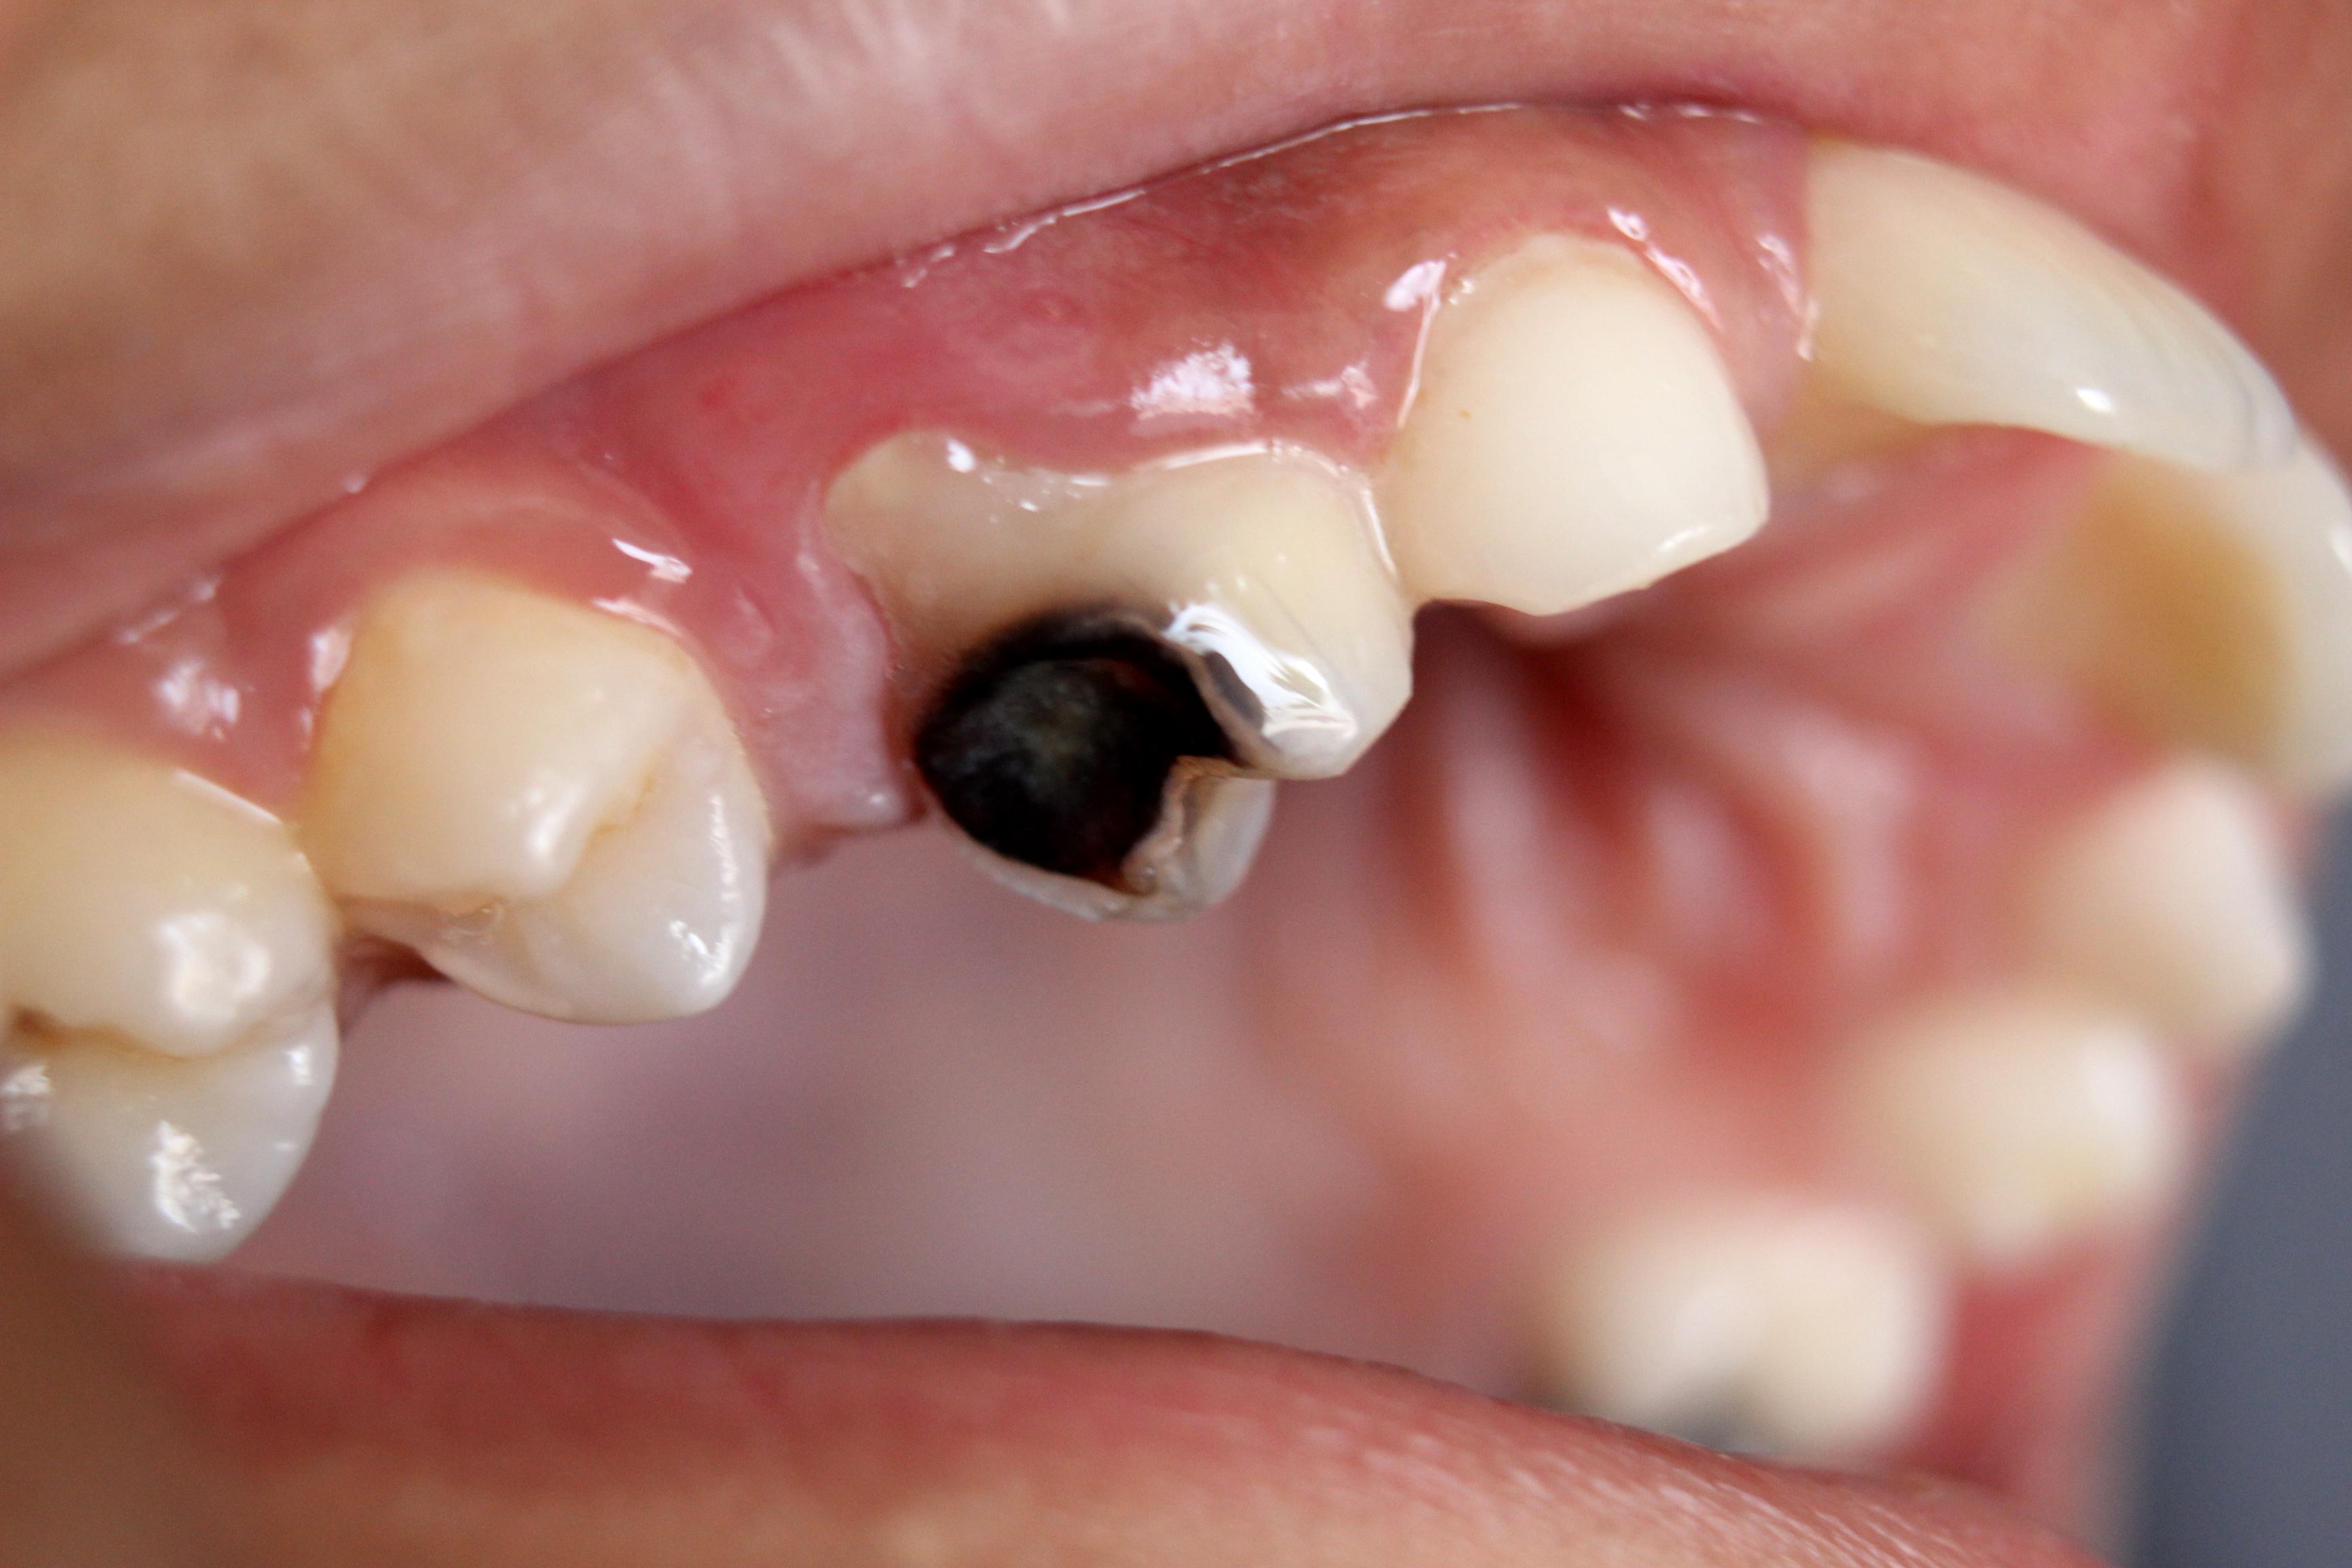 https-::upload.wikimedia.org:wikipedia:commons:2:2f:Dental_Caries_Cavity_2